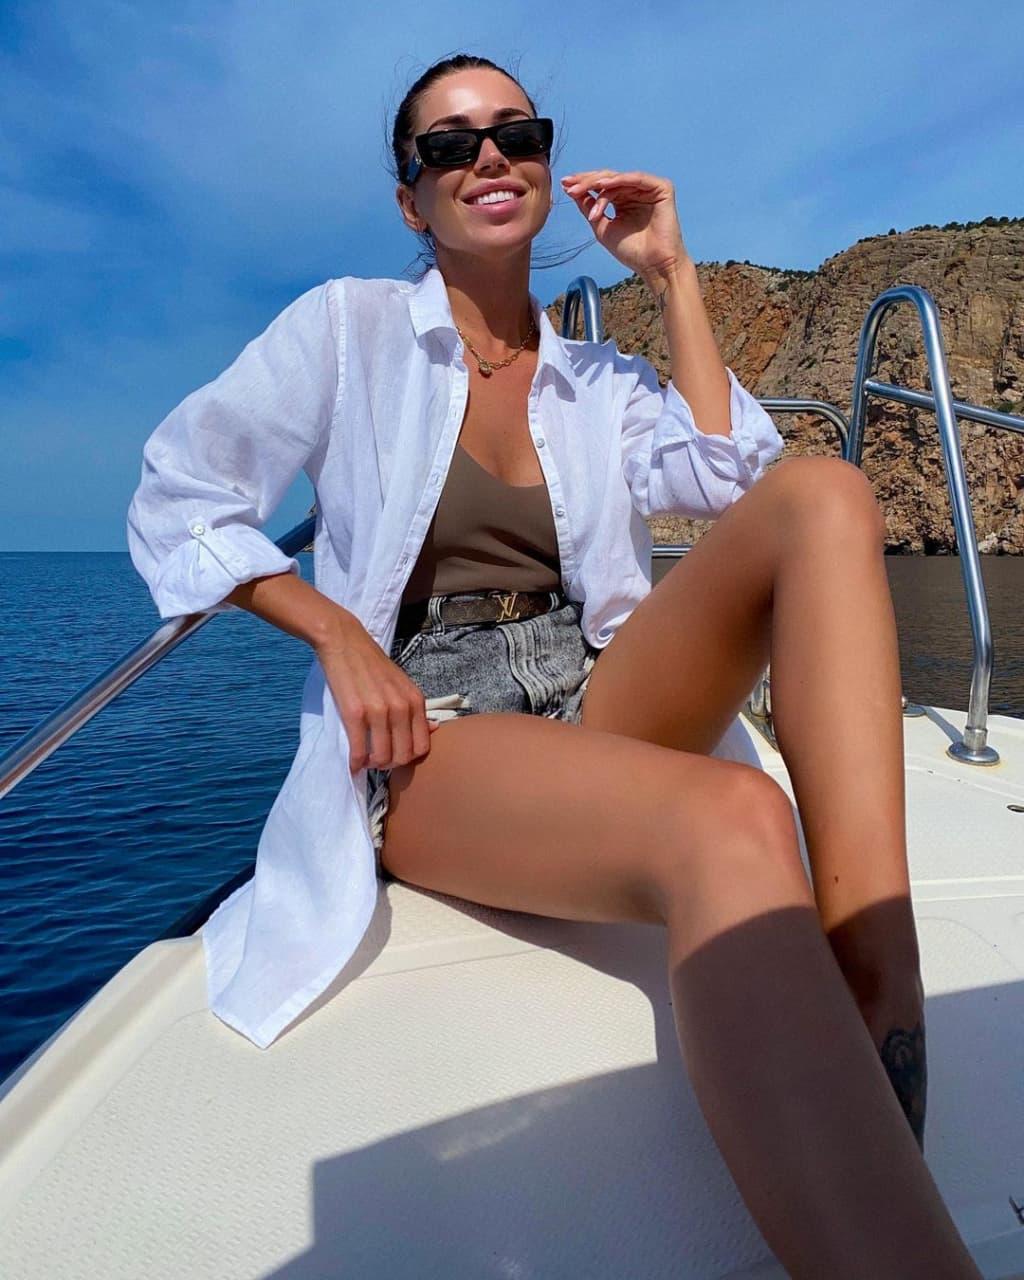 Карина Притченко – девушка Александра Марытновича. Кажется, из-за нее капитан «Краснодара» ушел от жены